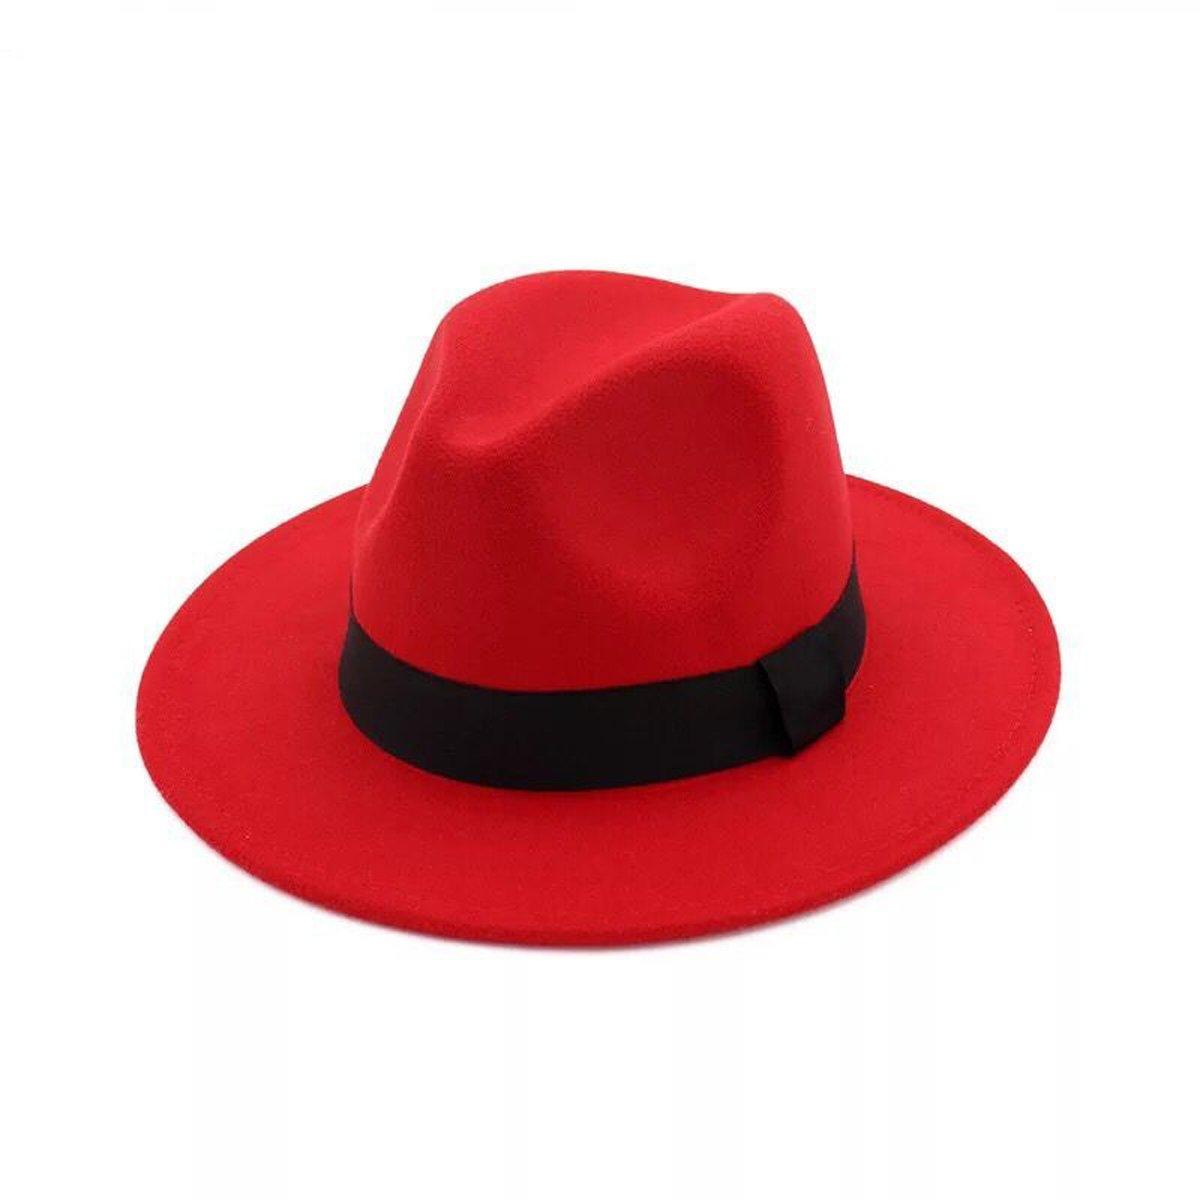 Lanzom Women Wide Brim Warm Wool Fedora Hat Retro Style Belt Panama Hat Halloween Gift One Size)